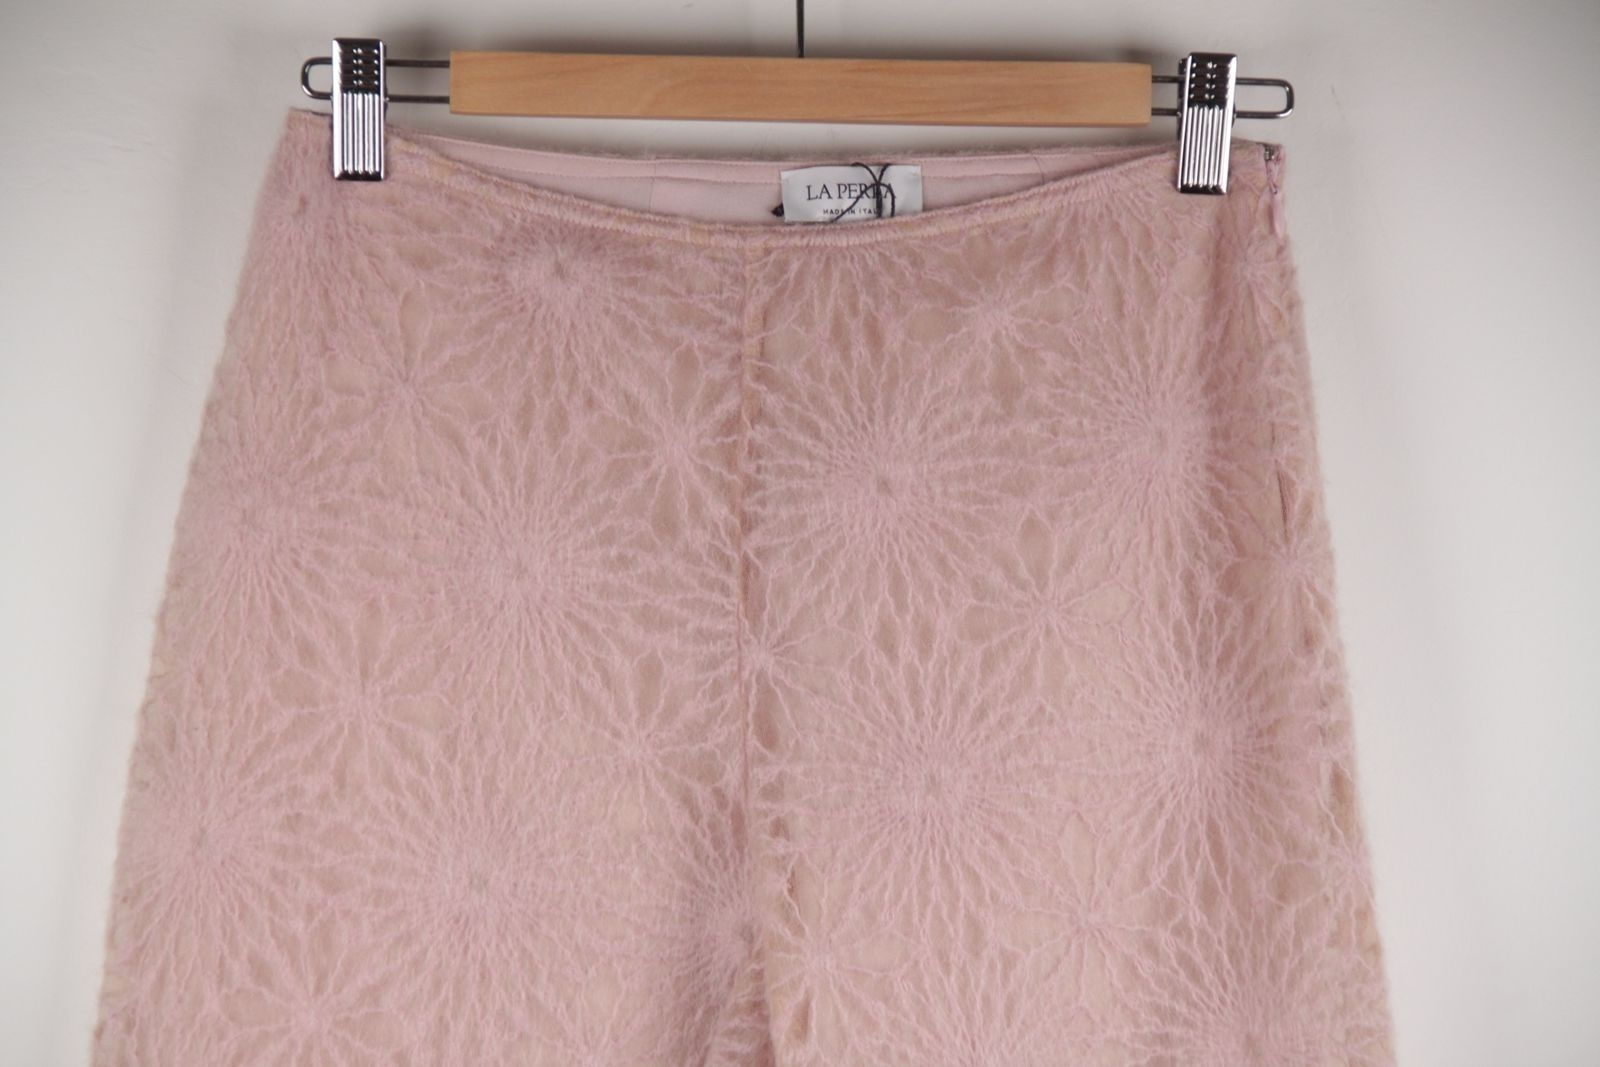 LA PERLA Italian Pink Mesh TROUSERS Flared Leg PANTS w/ WOOL Embroidery 42 IT